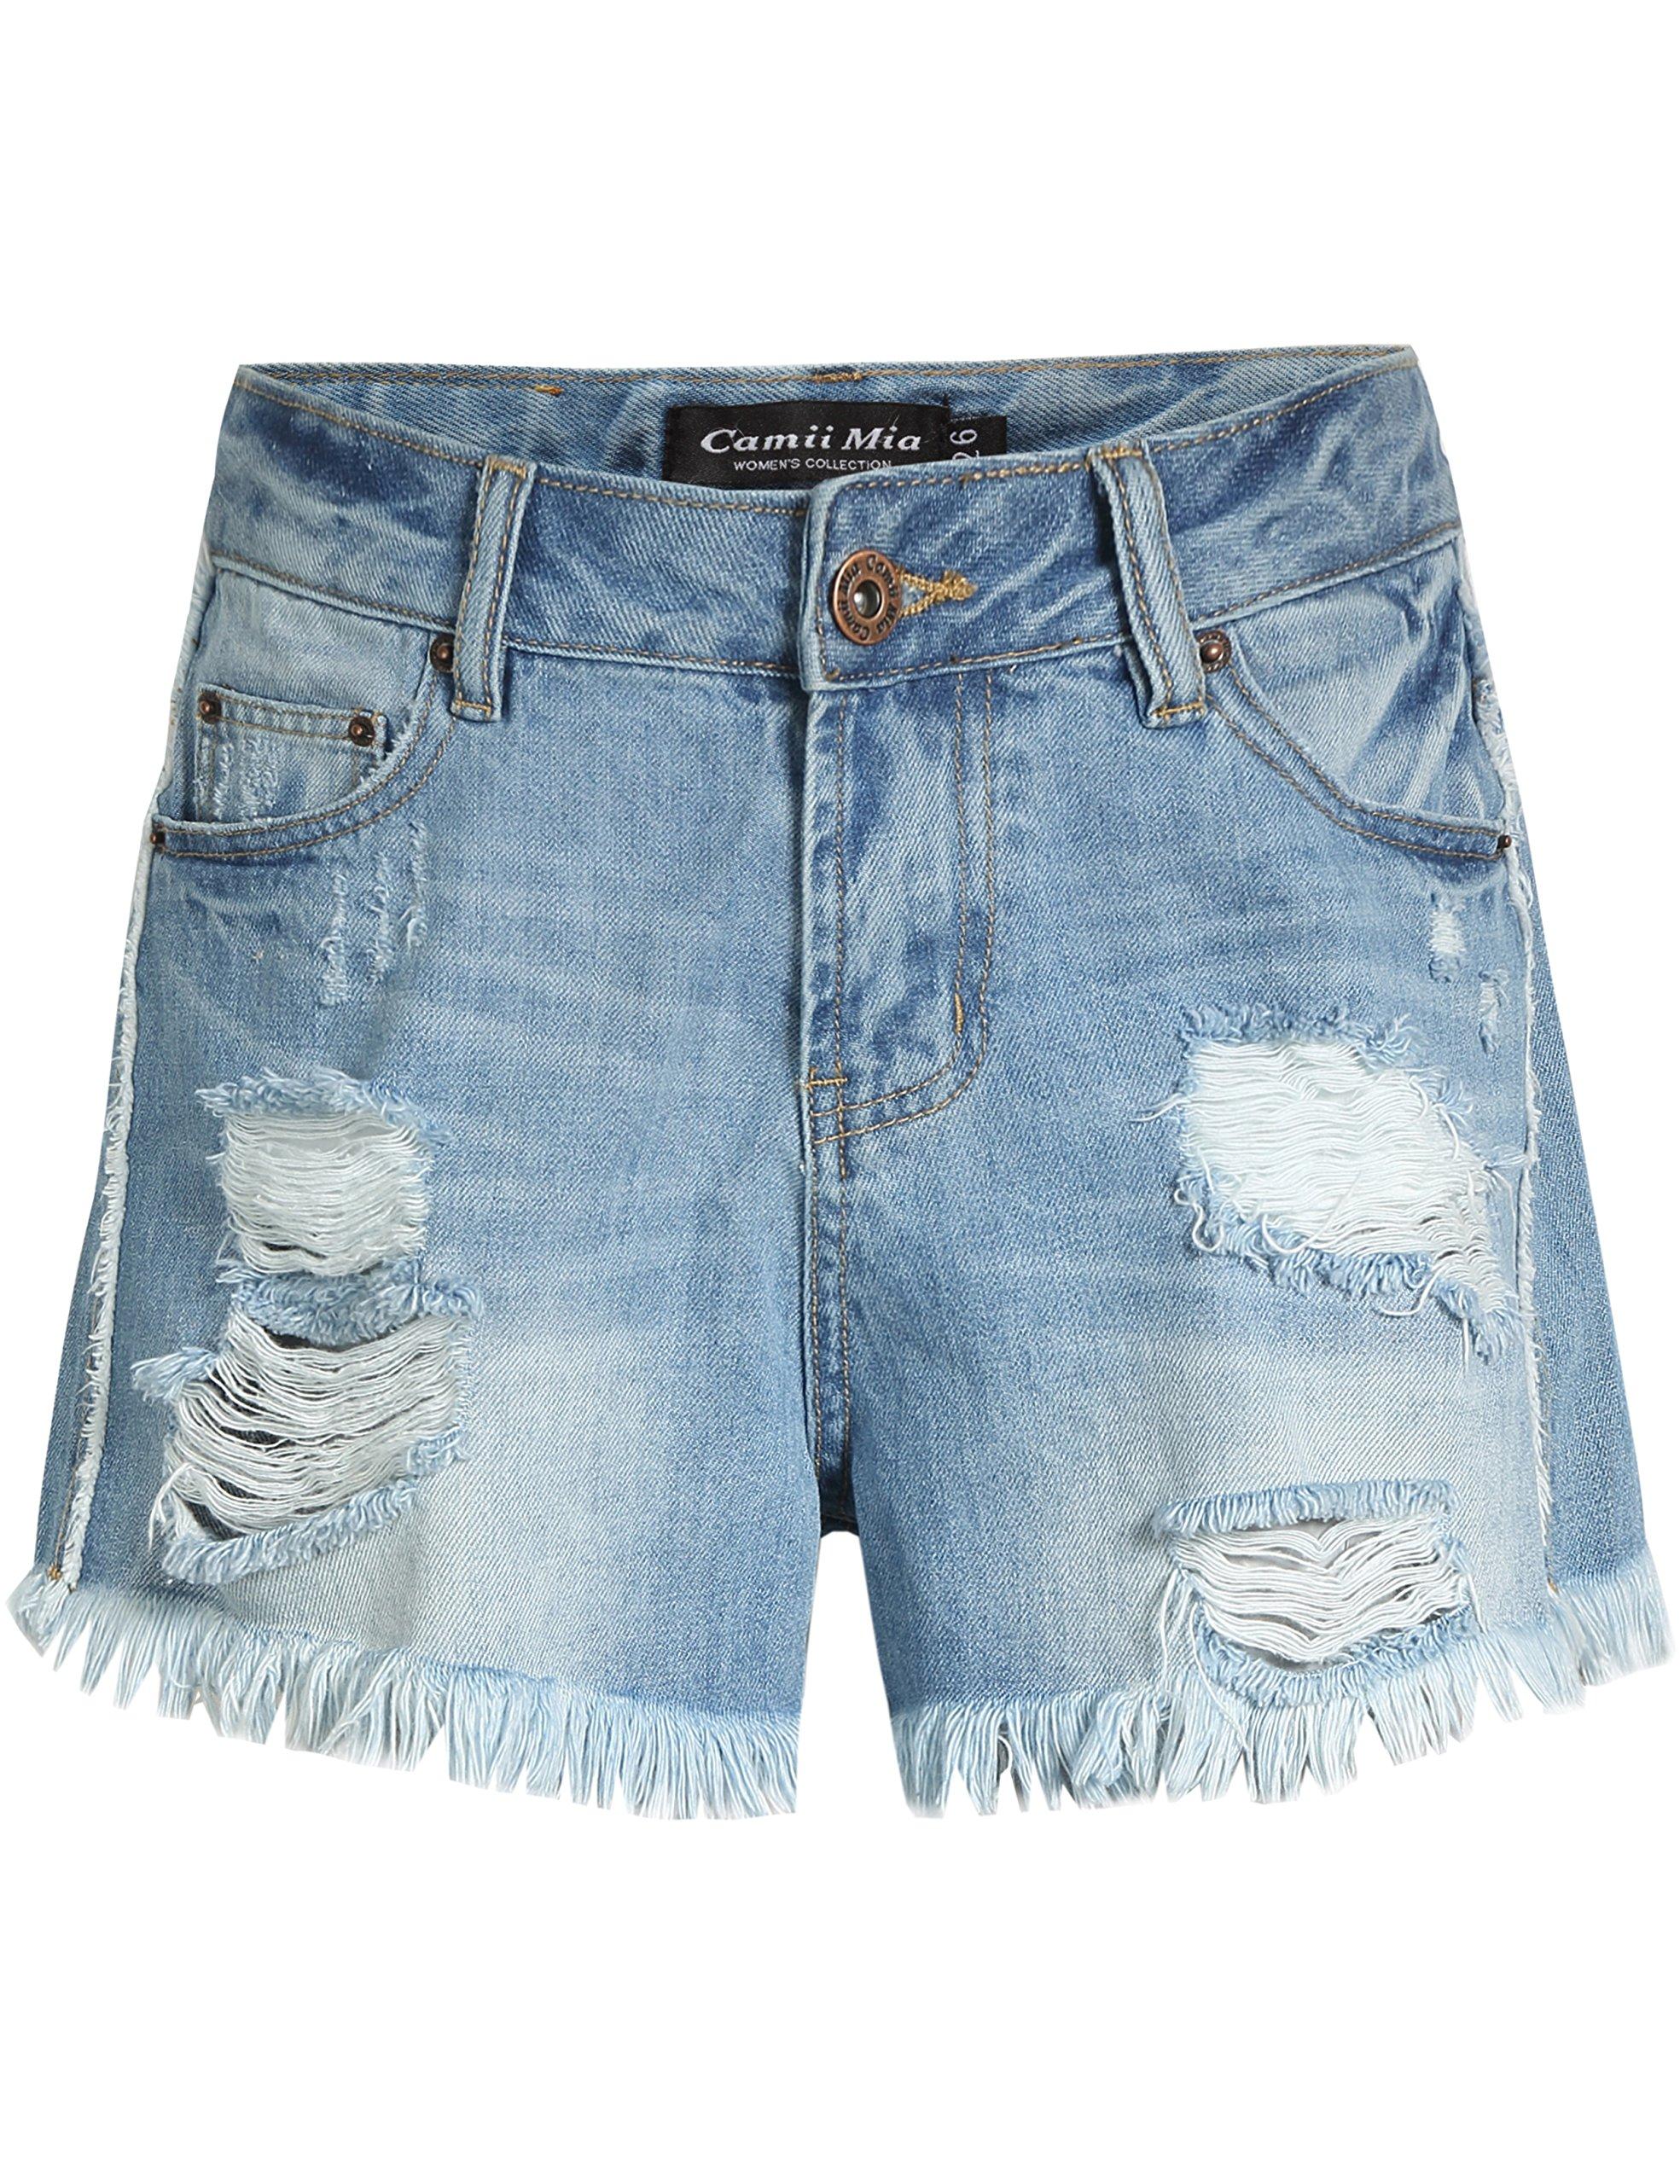 Camii Mia Women's Distressed Mid Rise Denim Shorts (27, Light Blue)